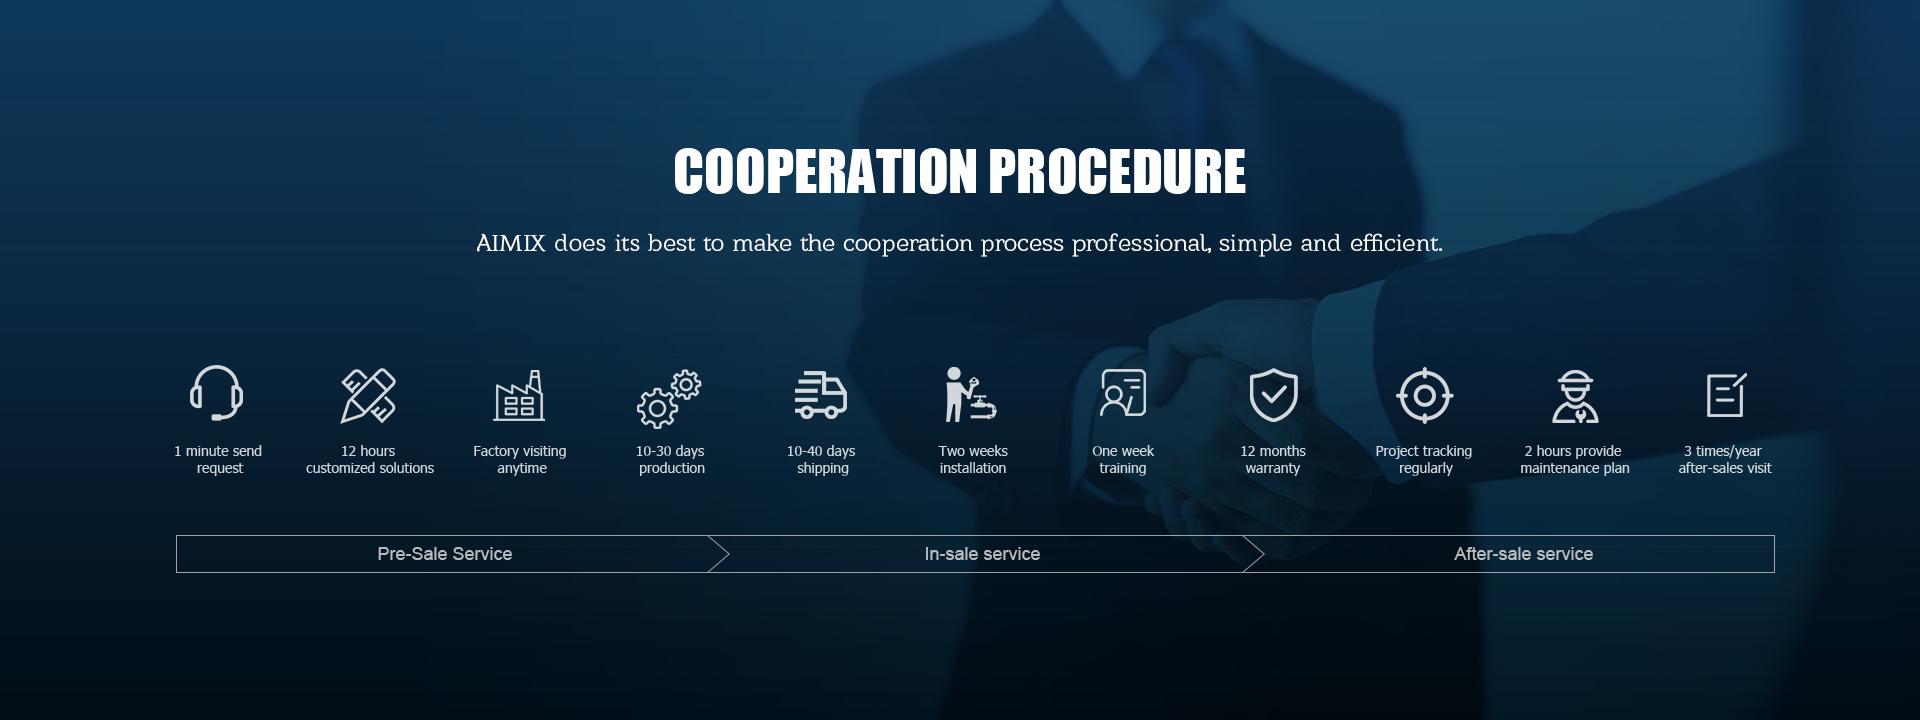 aimix banner cooperation procedure